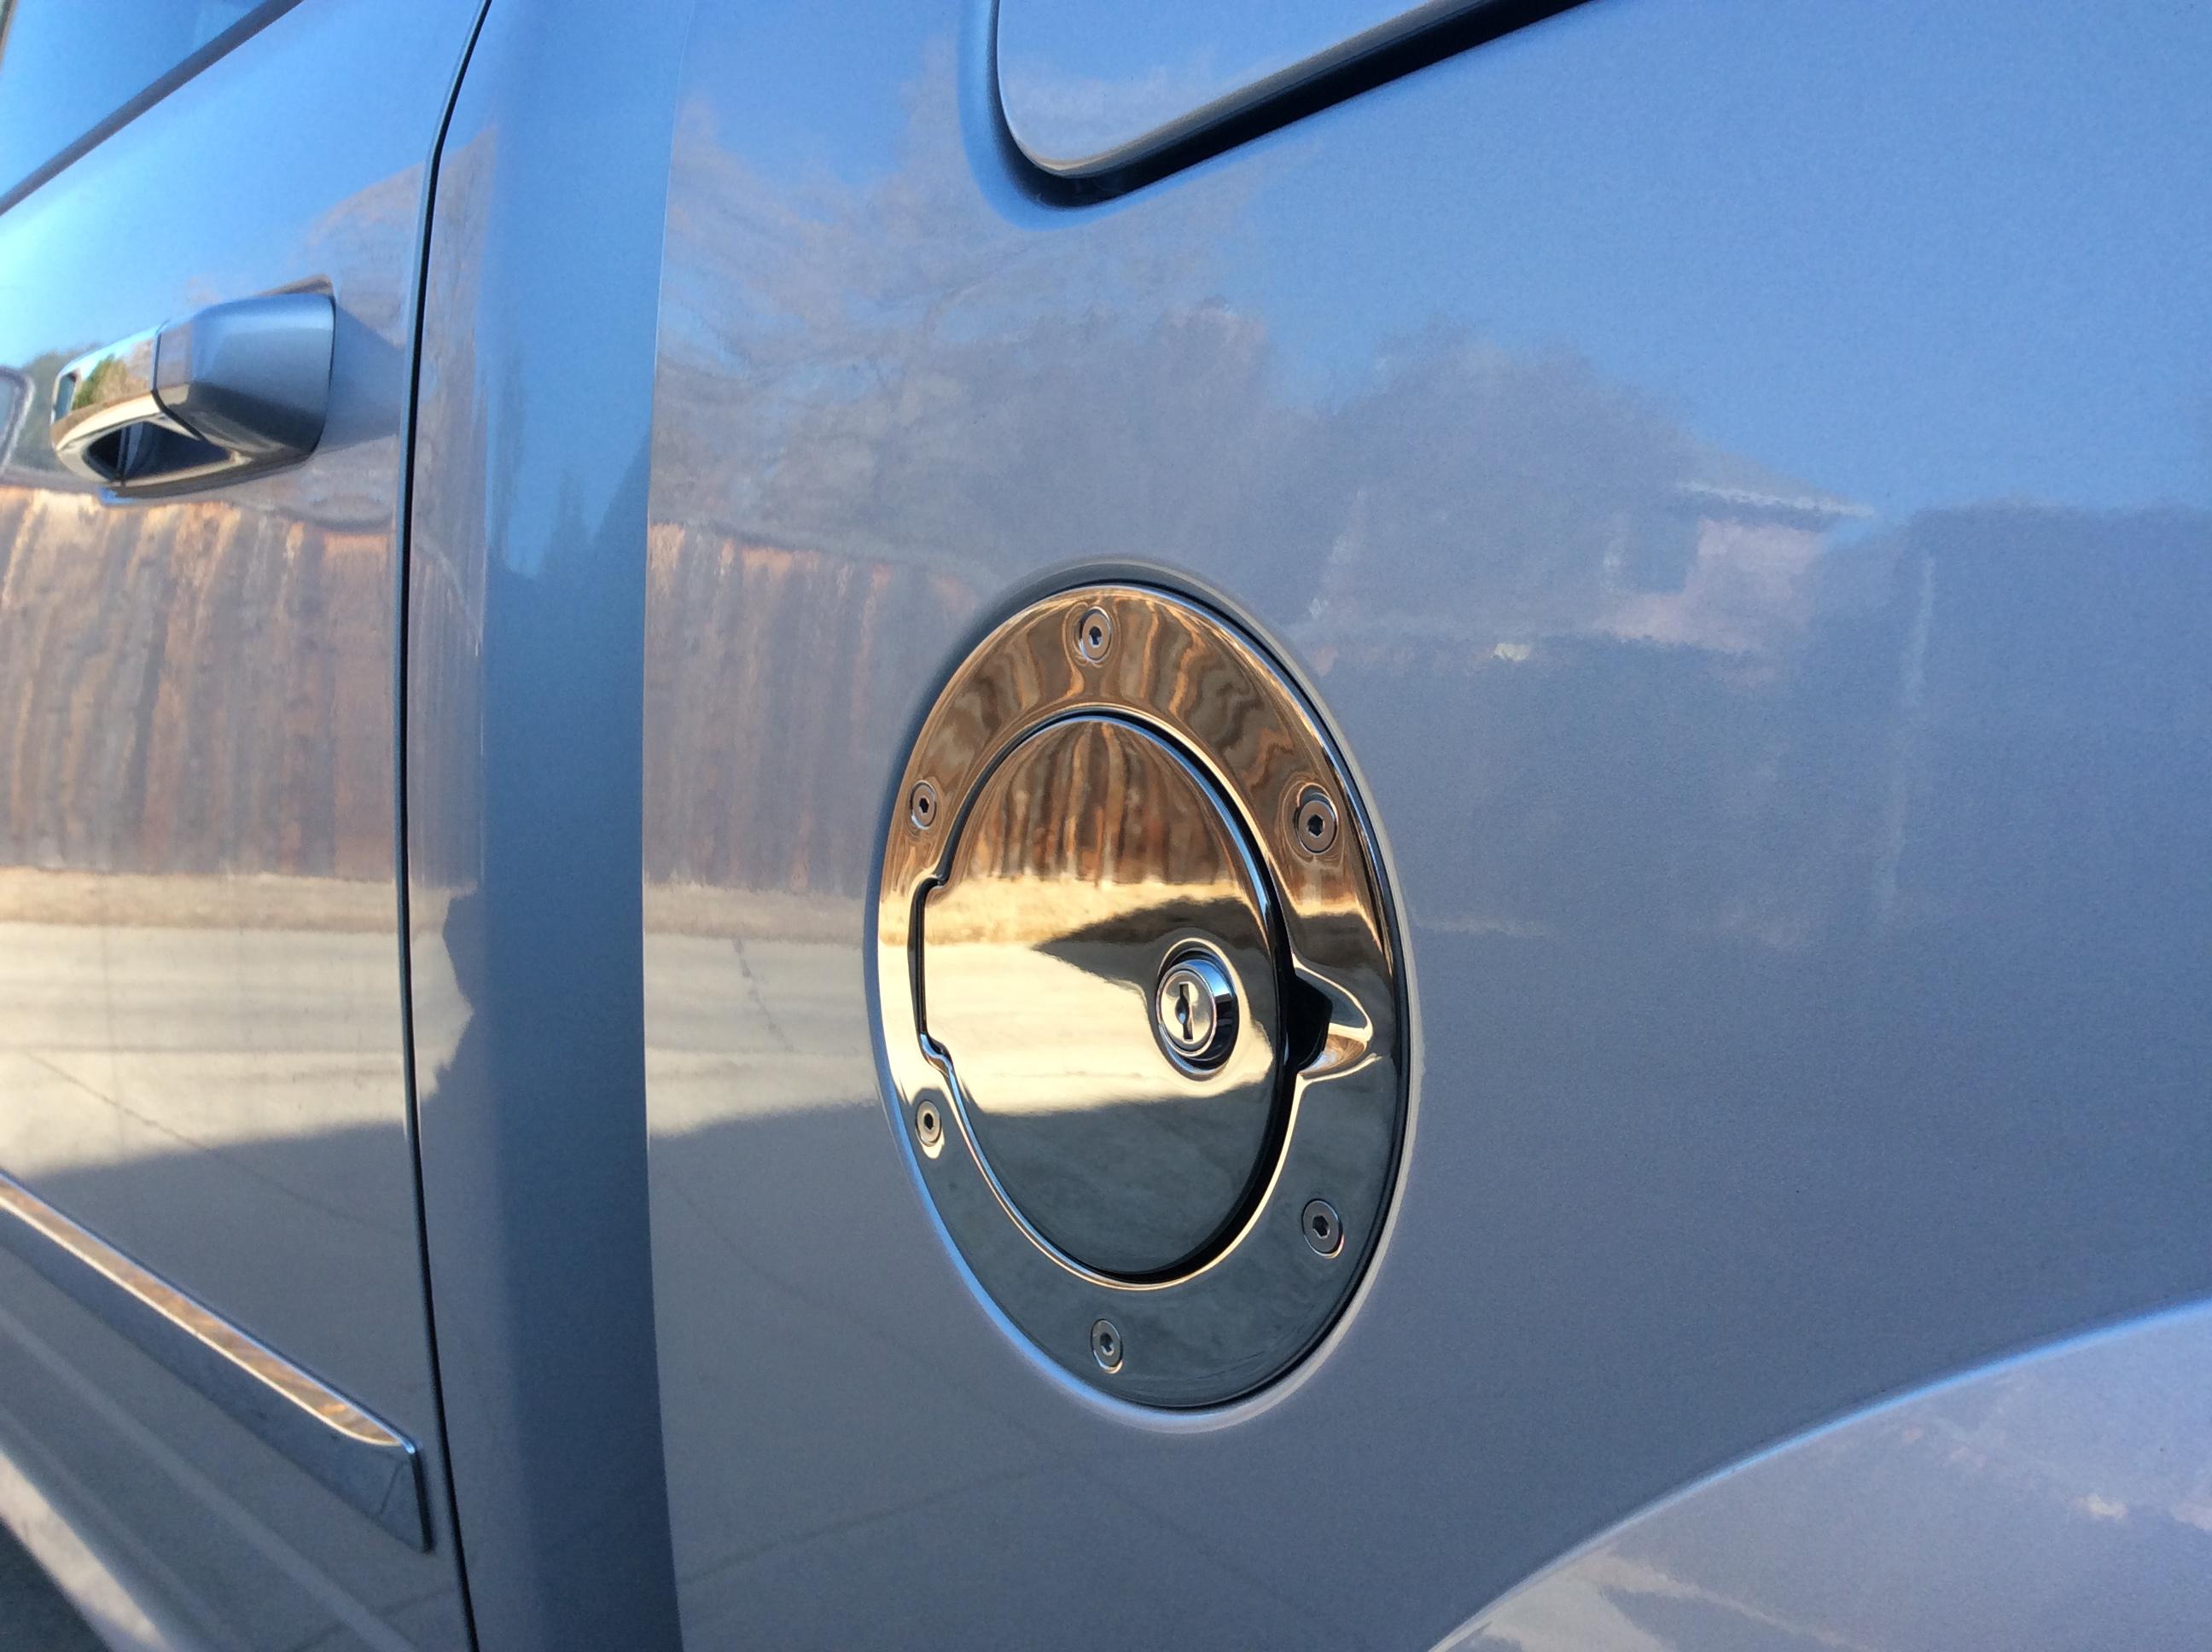 Dodge Ram 1500 Fuel Cap Wiring Diagrams Iron Man Flex Sensor Repulsor Circuit Schematic Flickr Photo Finally A Mopar For The Ed Rh Ram1500diesel Com 2002